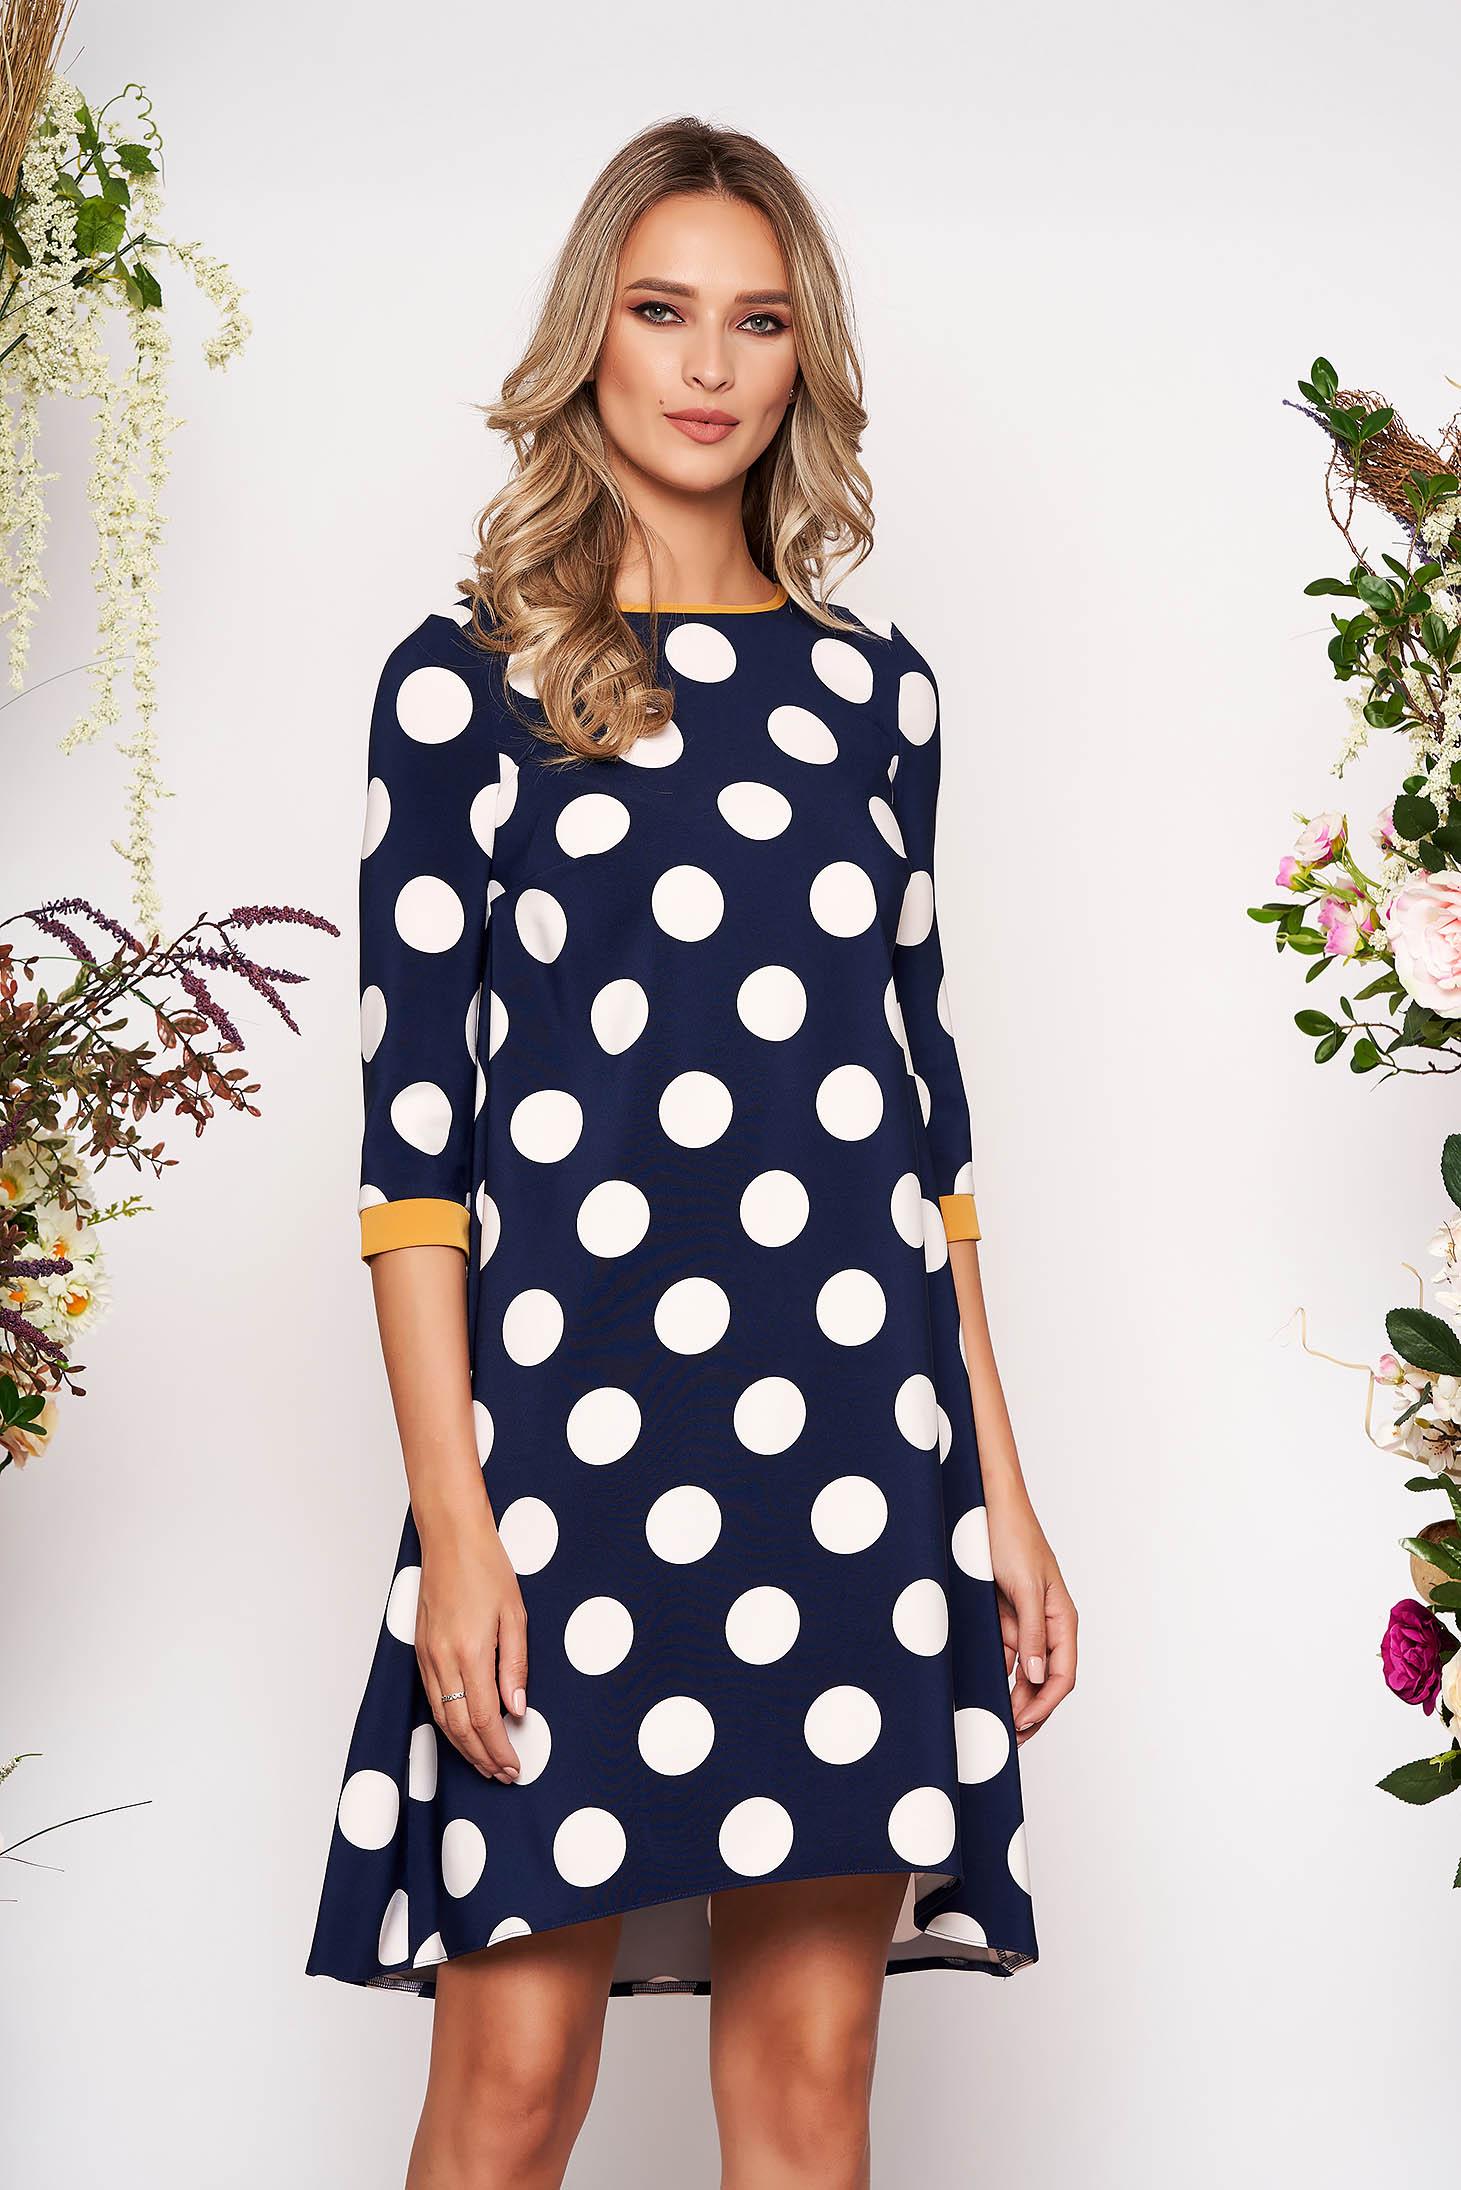 StarShinerS darkblue daily flared dress 3/4 sleeve slightly elastic fabric dots print